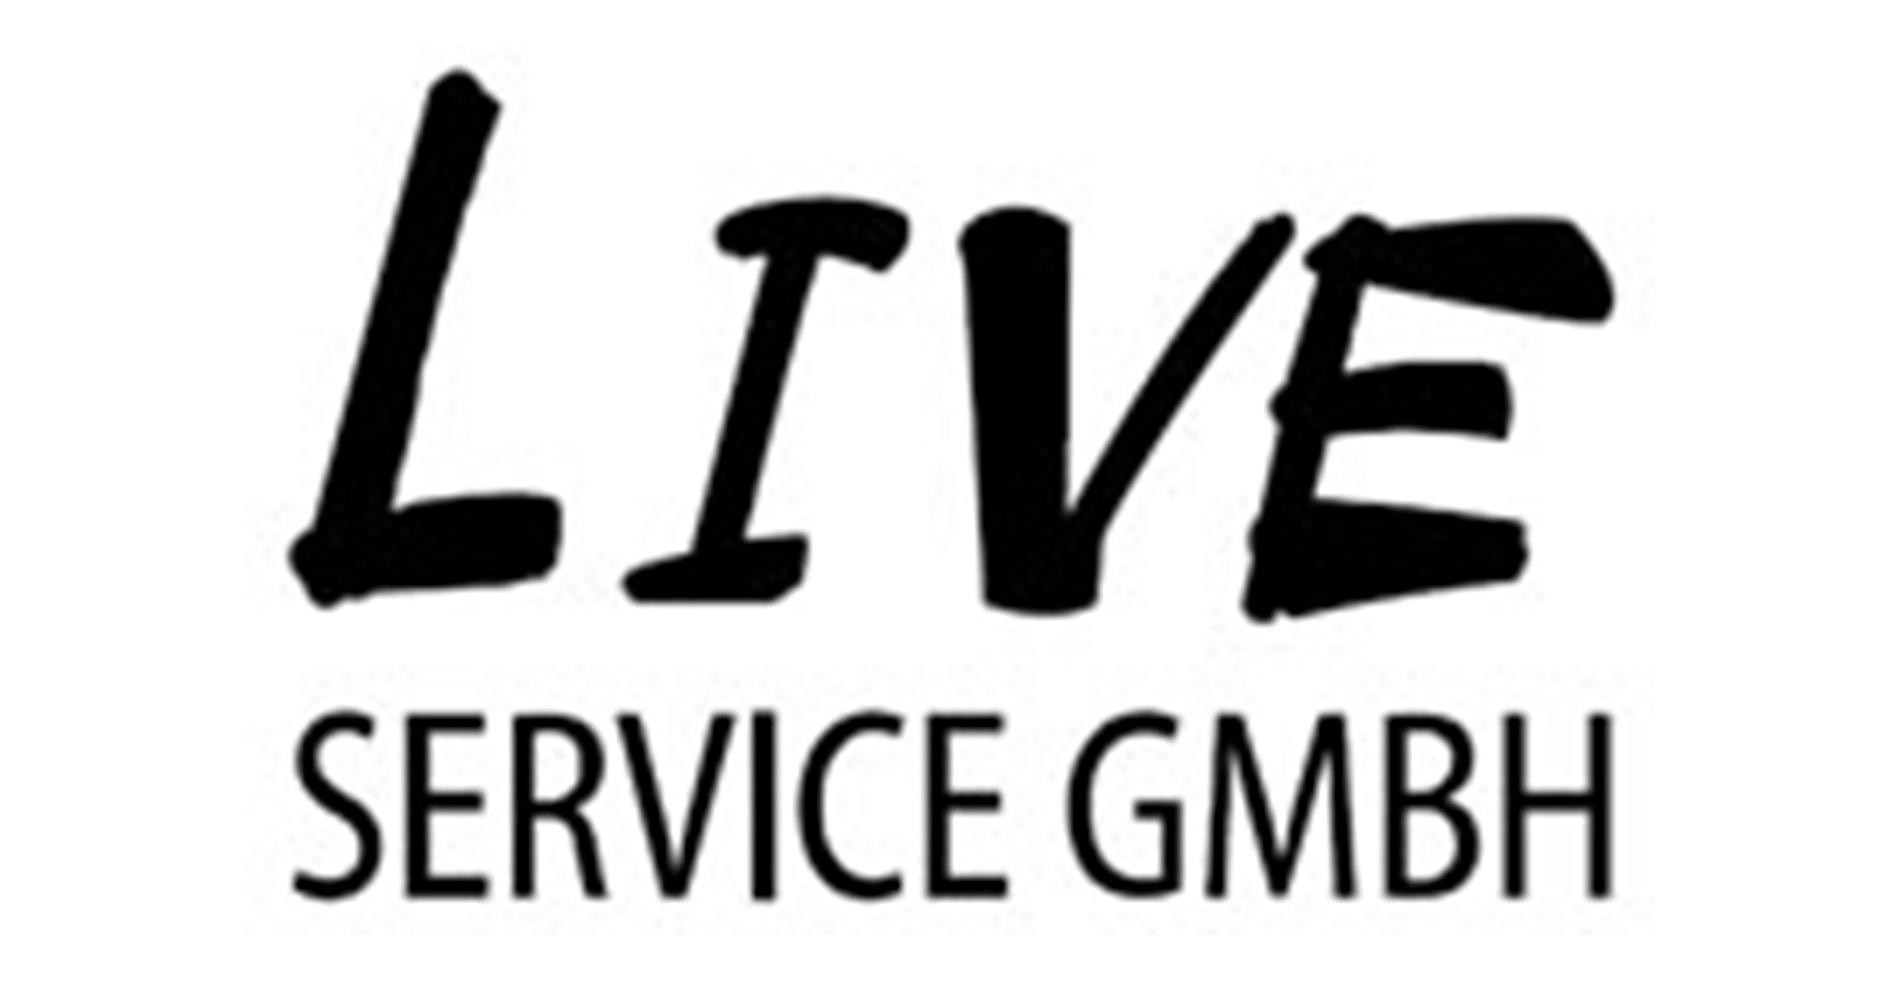 Live Service GMBH Logo